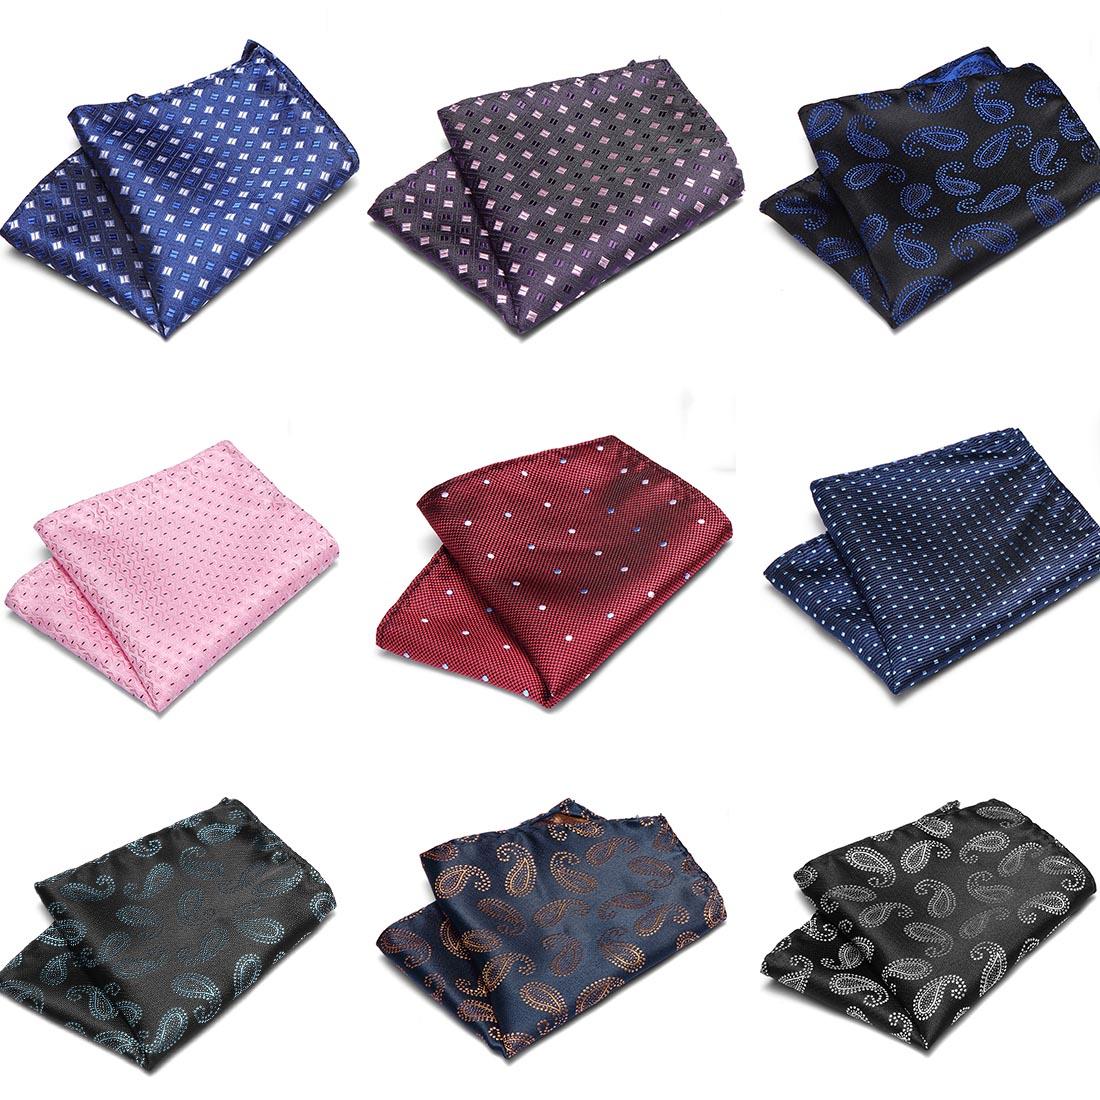 Men's Handkerchief Polka Dot Striped Floral Printed Hankies Silk Hanky Business Wedding Pocket Square Chest Towel 22*22CM